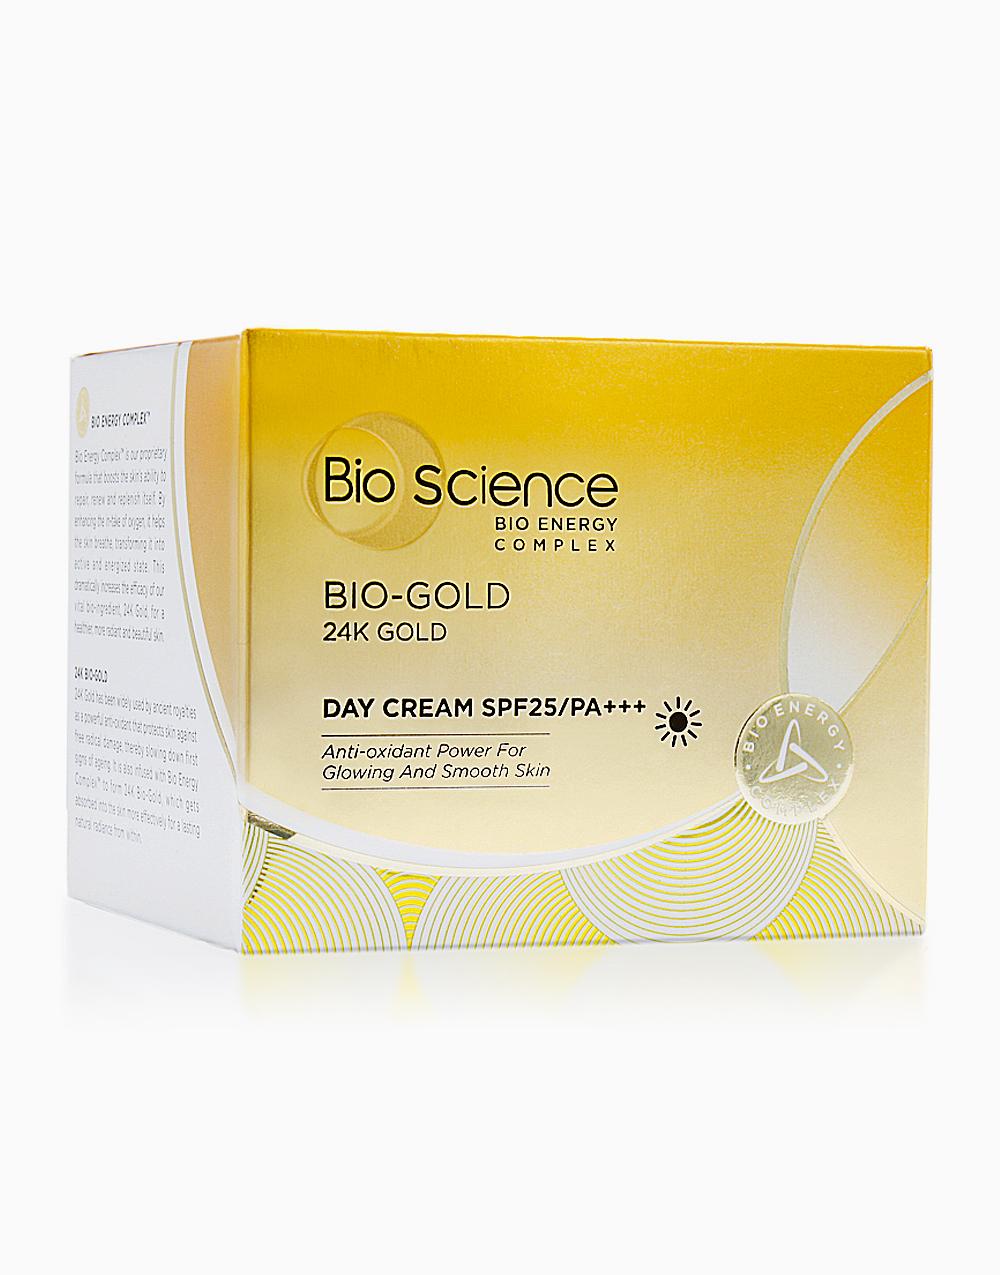 Bio-Gold Day Cream SPF 25 40g Anti-Aging Moisturizing Day Cream with SPF 25 by Bio Science